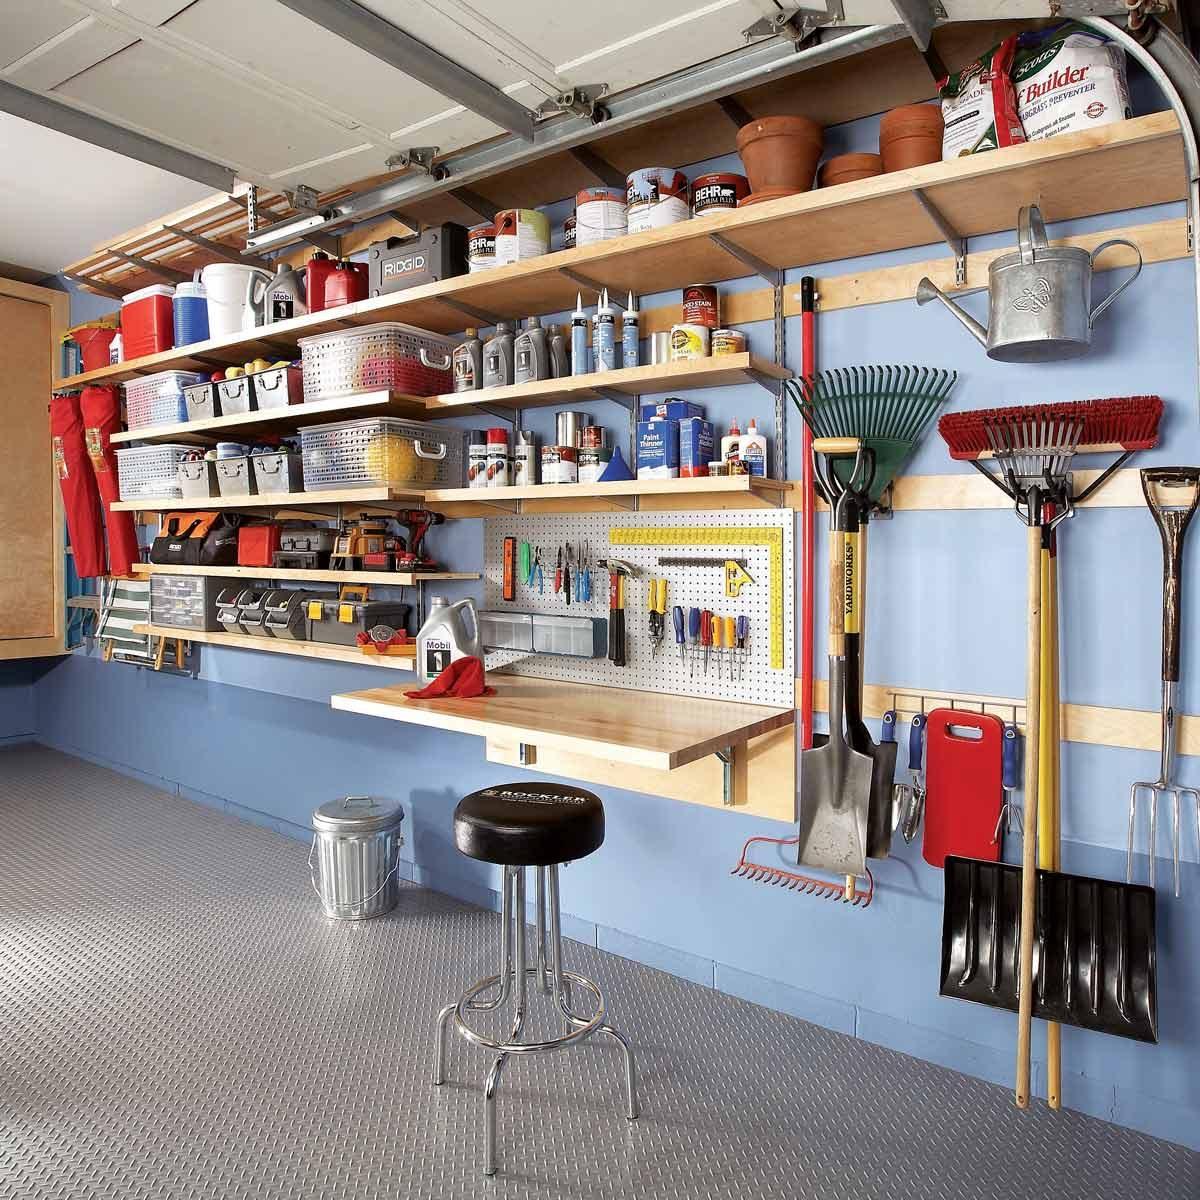 51 Brilliant Ways to Organize Your Garage   The Family ... on Organized Garage  id=93756